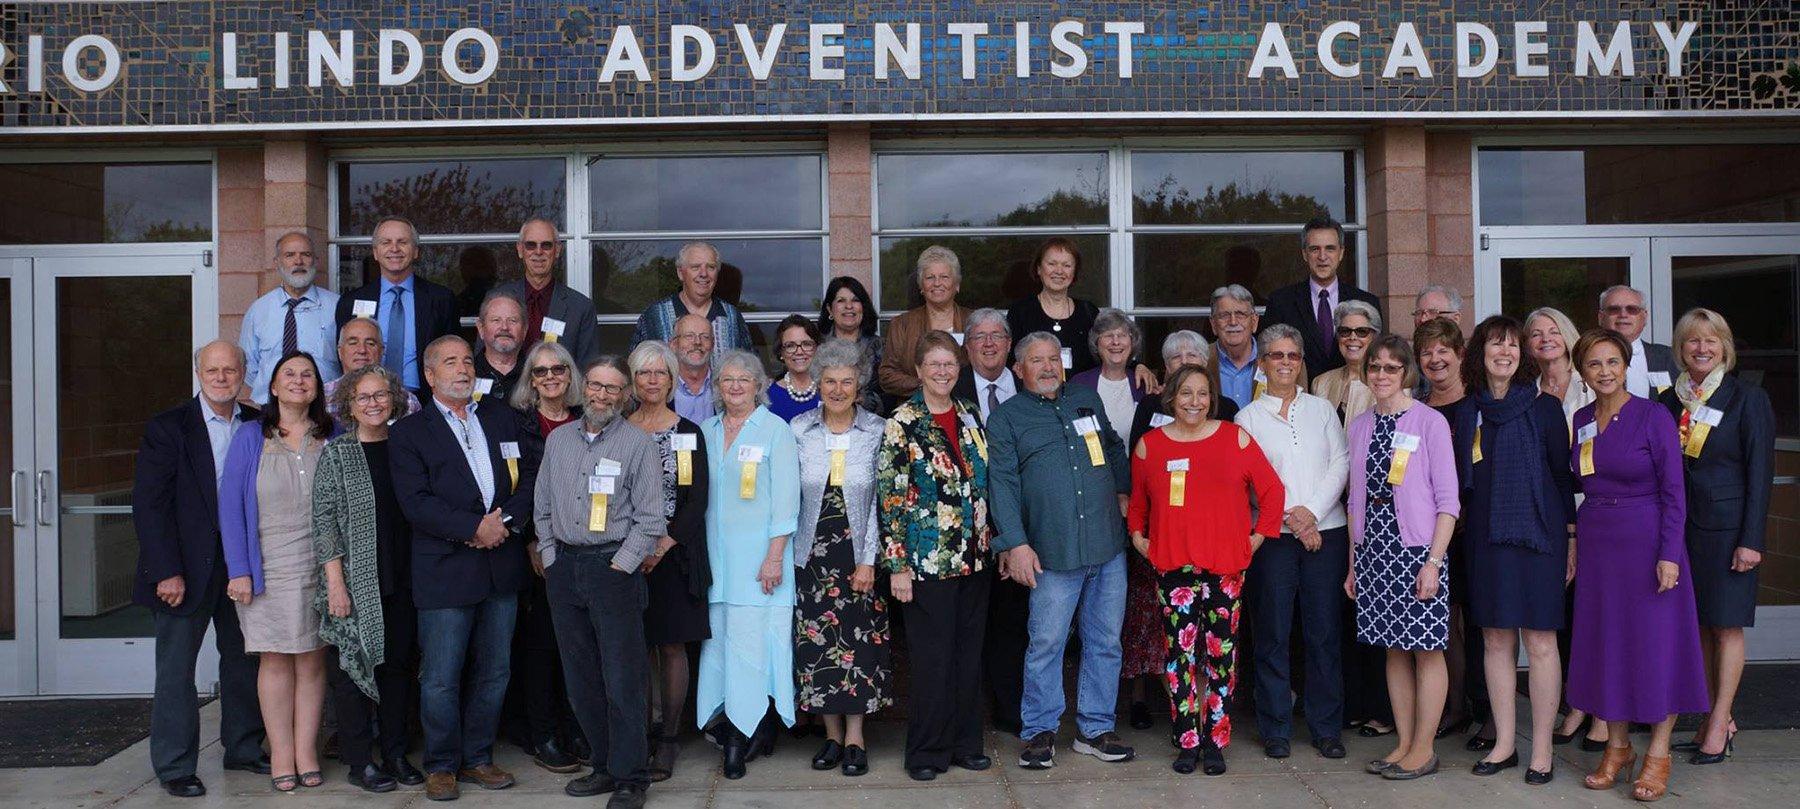 50 year alumni class smiles at camera